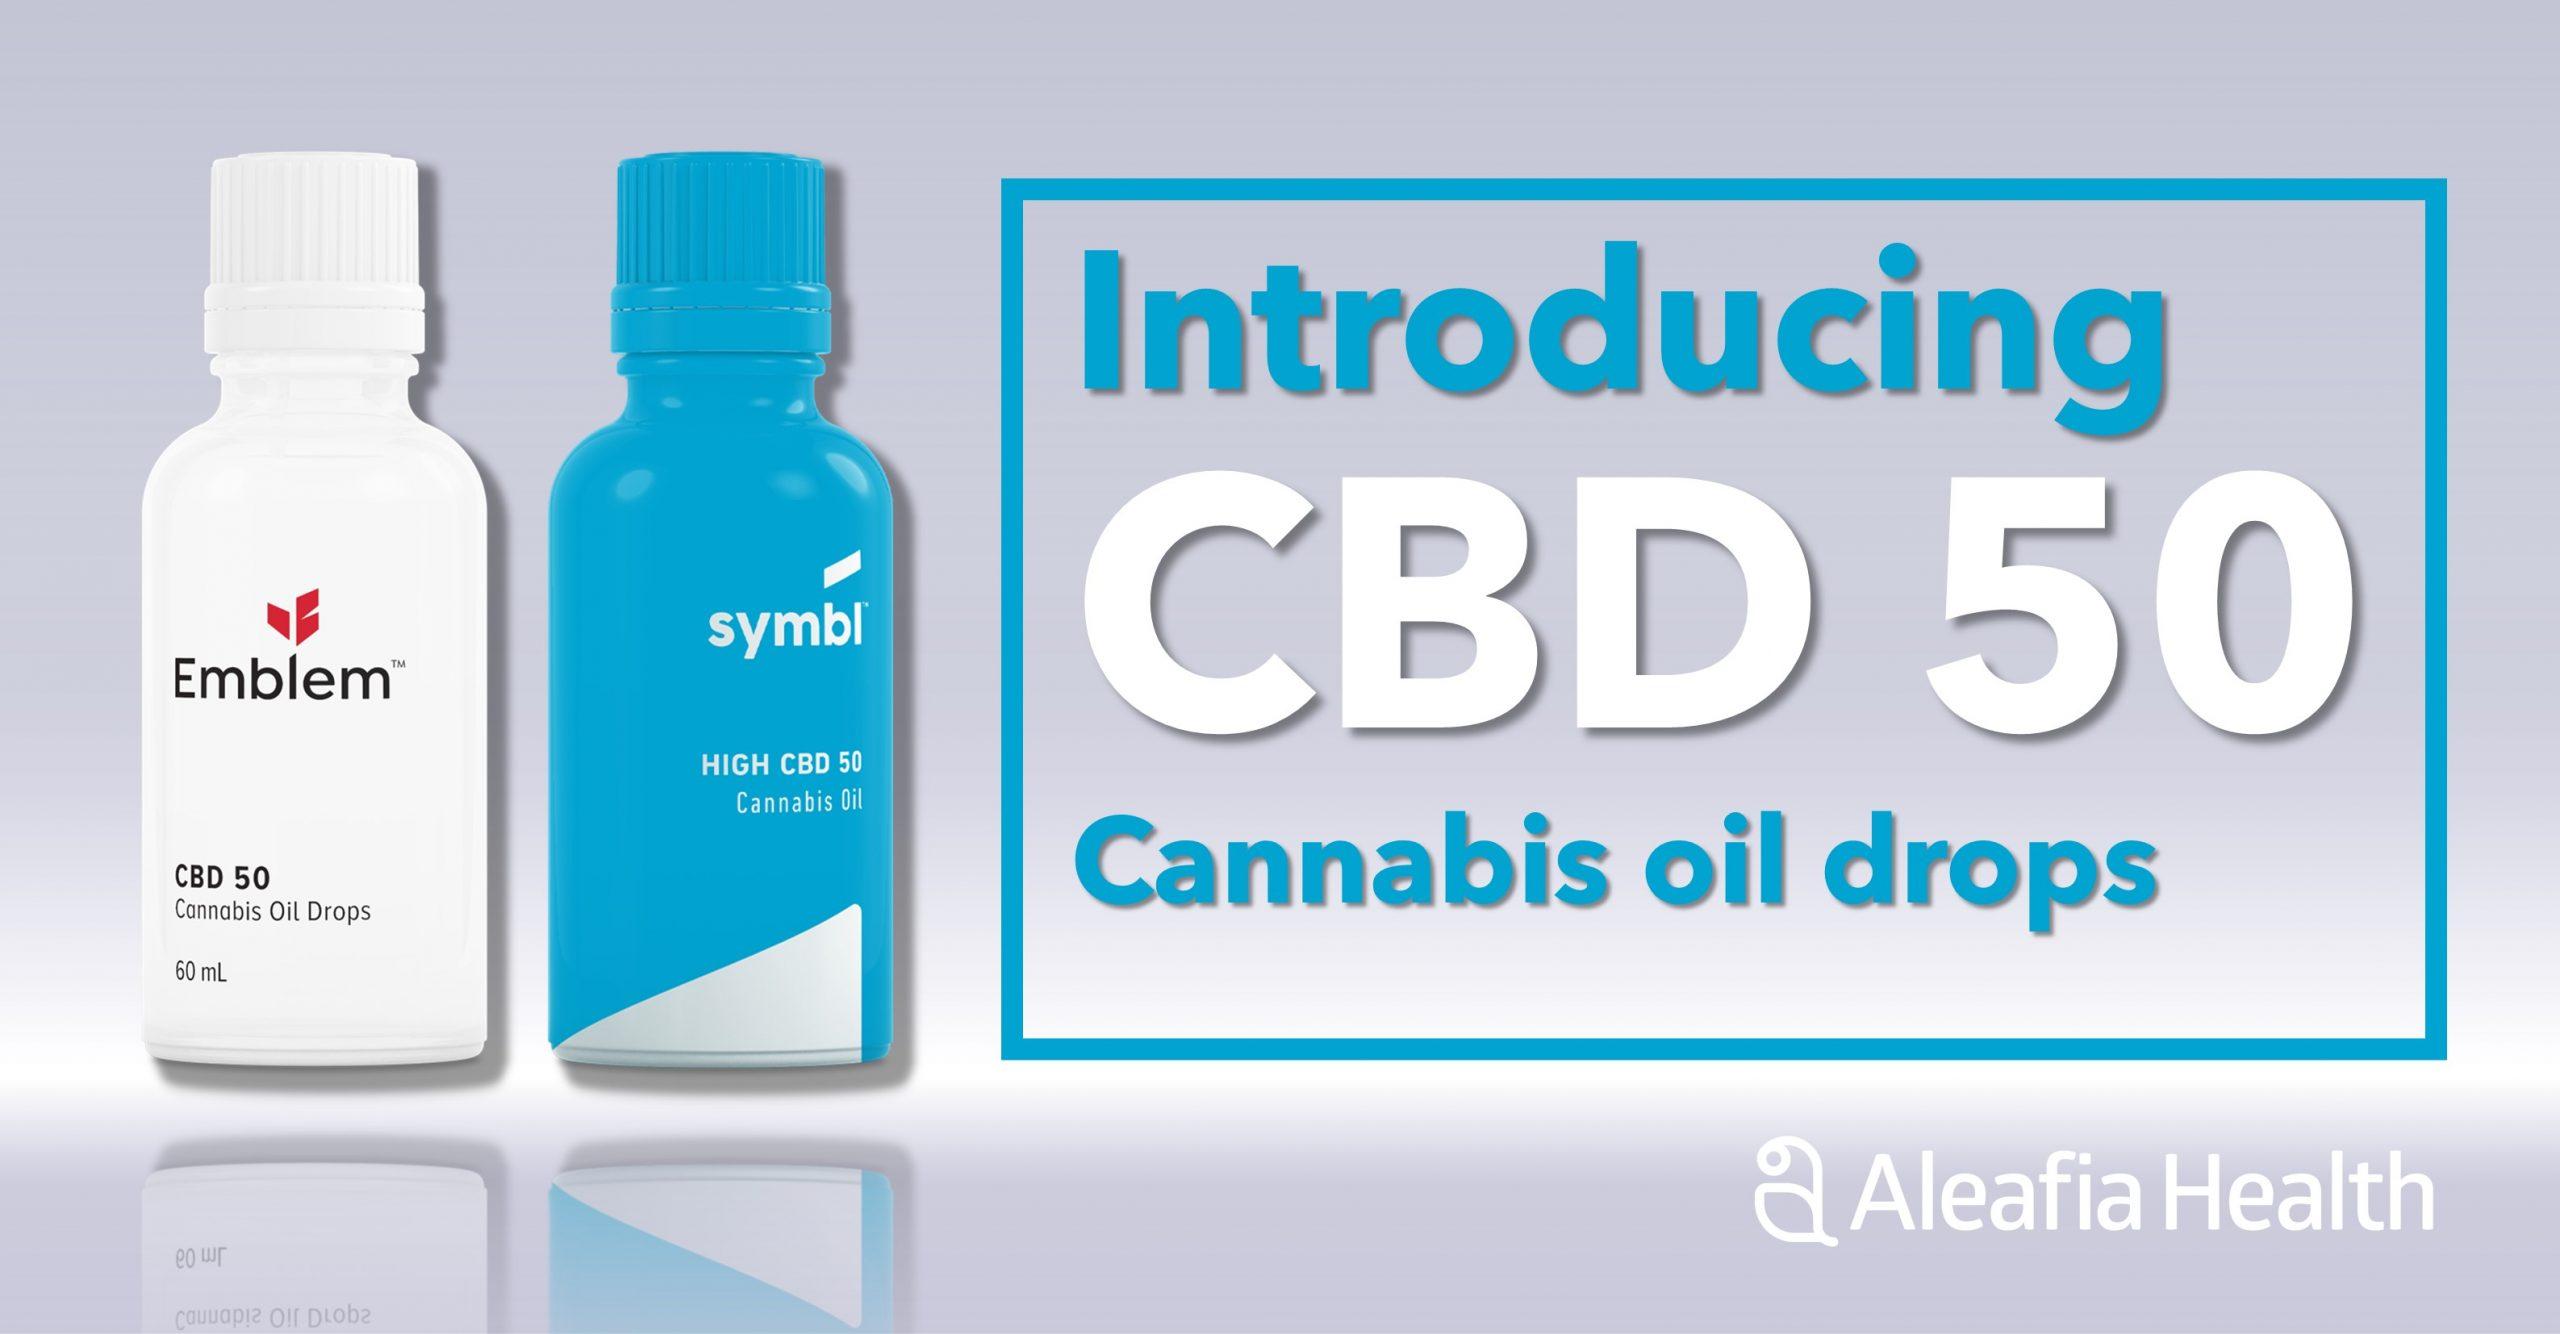 Aleafia Health Launches High Potency CBD 50 Cannabis Oil